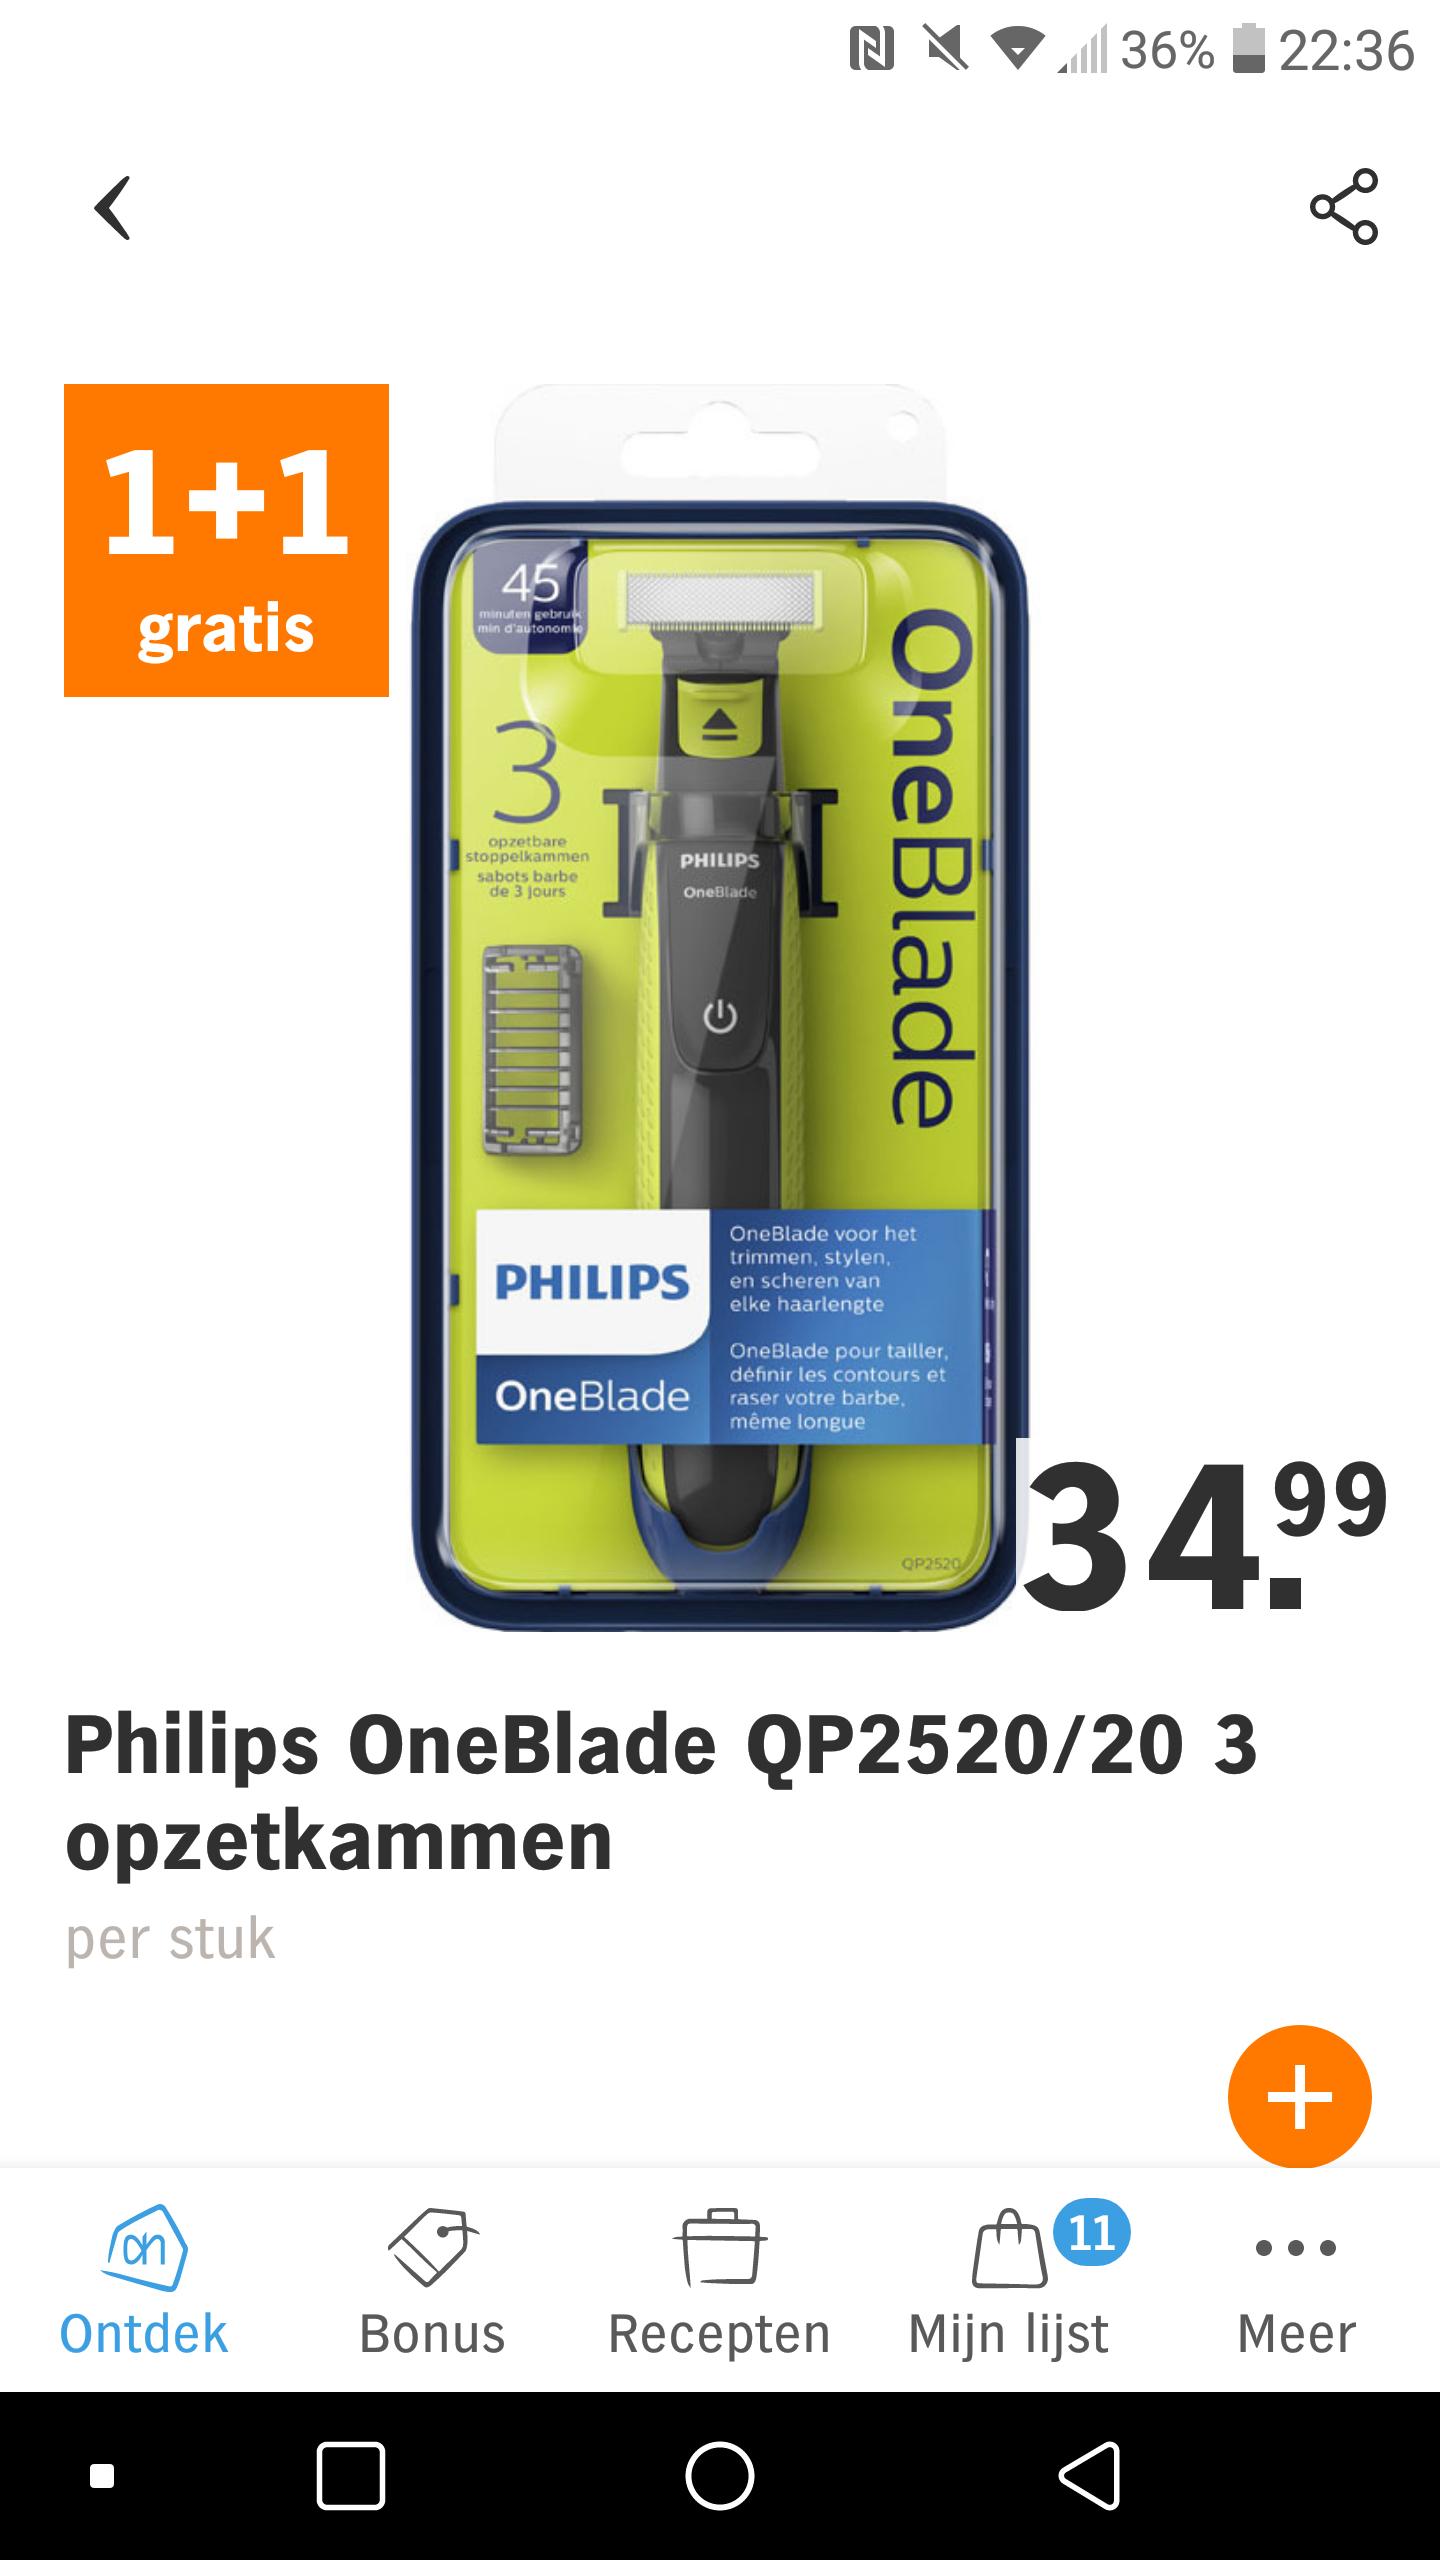 Philips OneBlade QP2520/20 1+1gratis